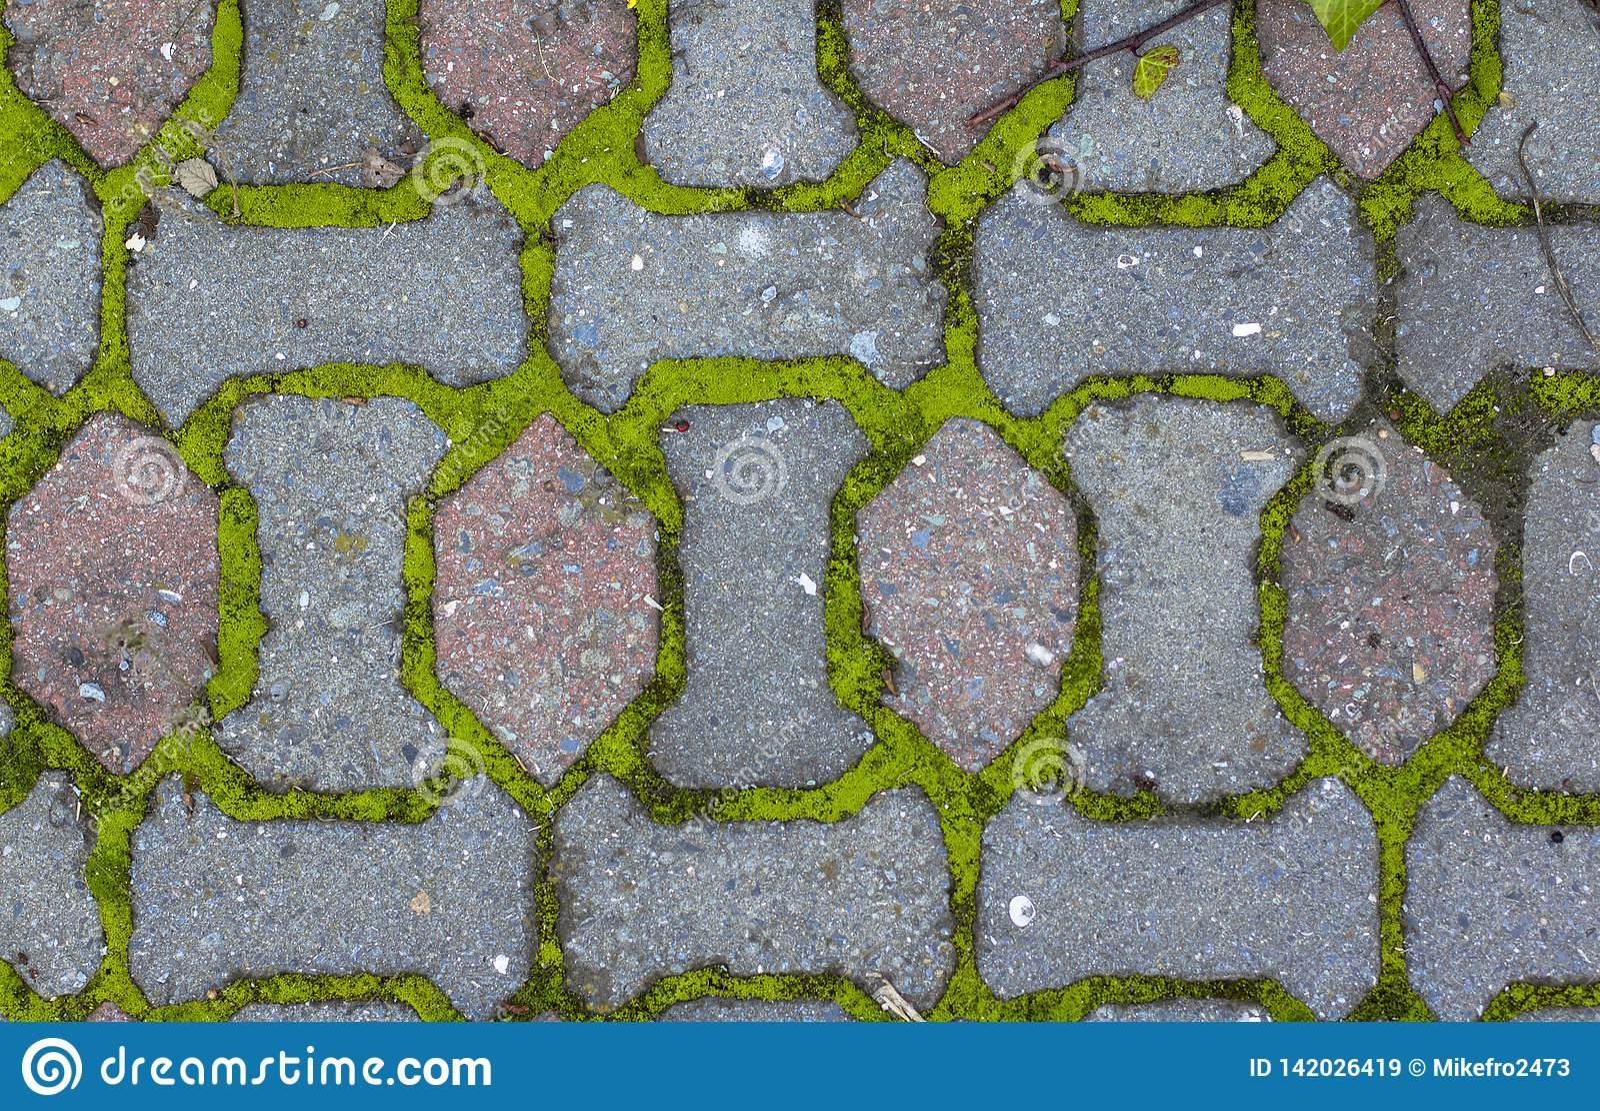 Paving stones and moss between bricks. Texture